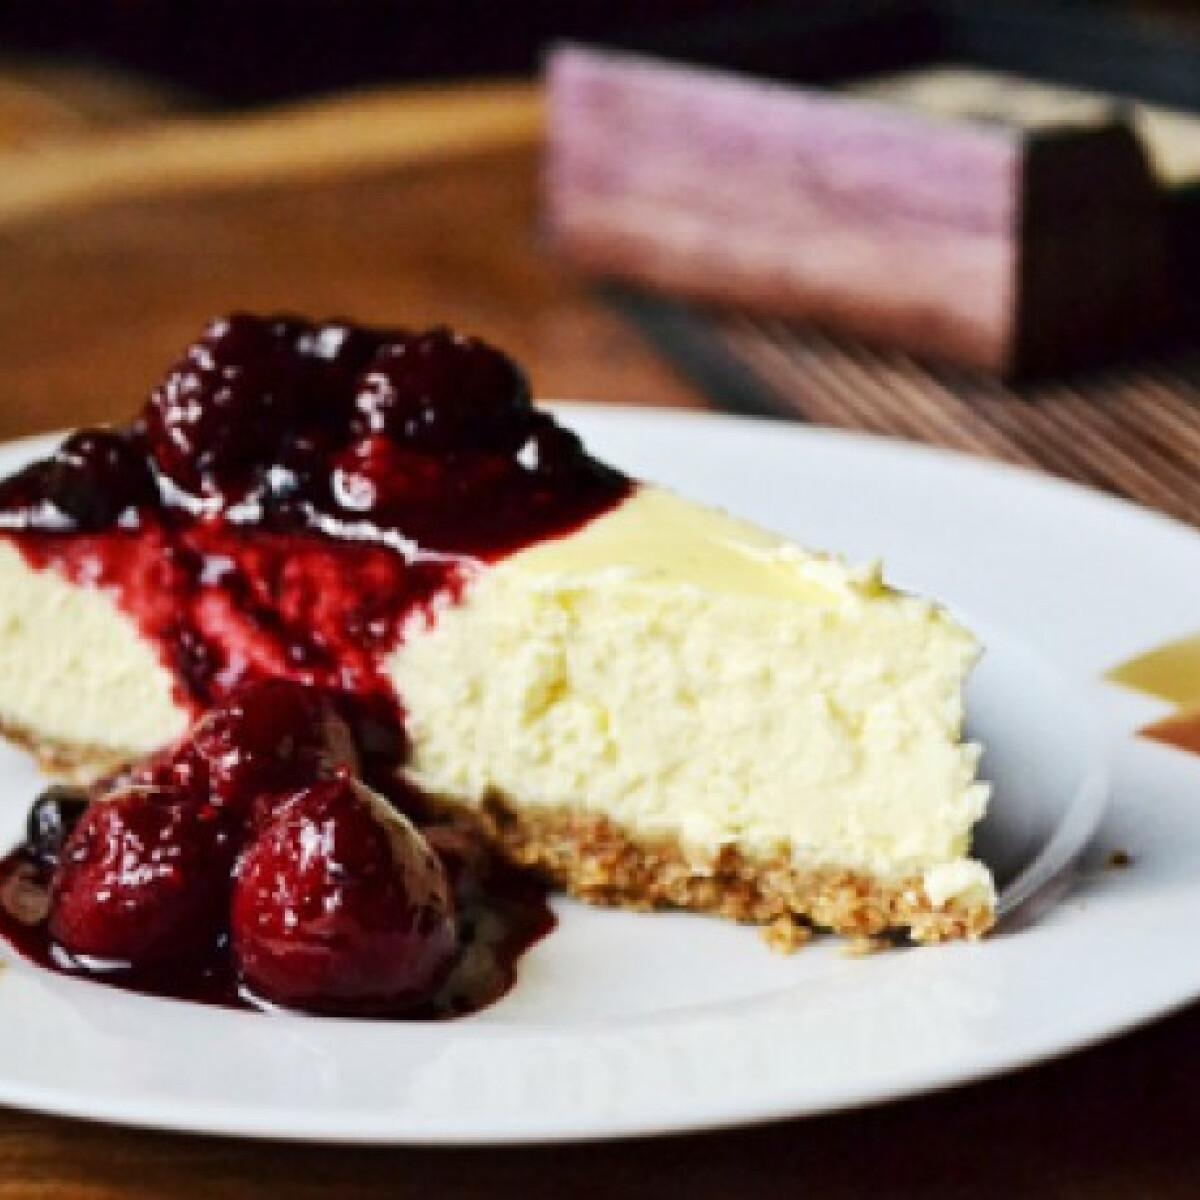 Ezen a képen: Mascarpone cheesecake